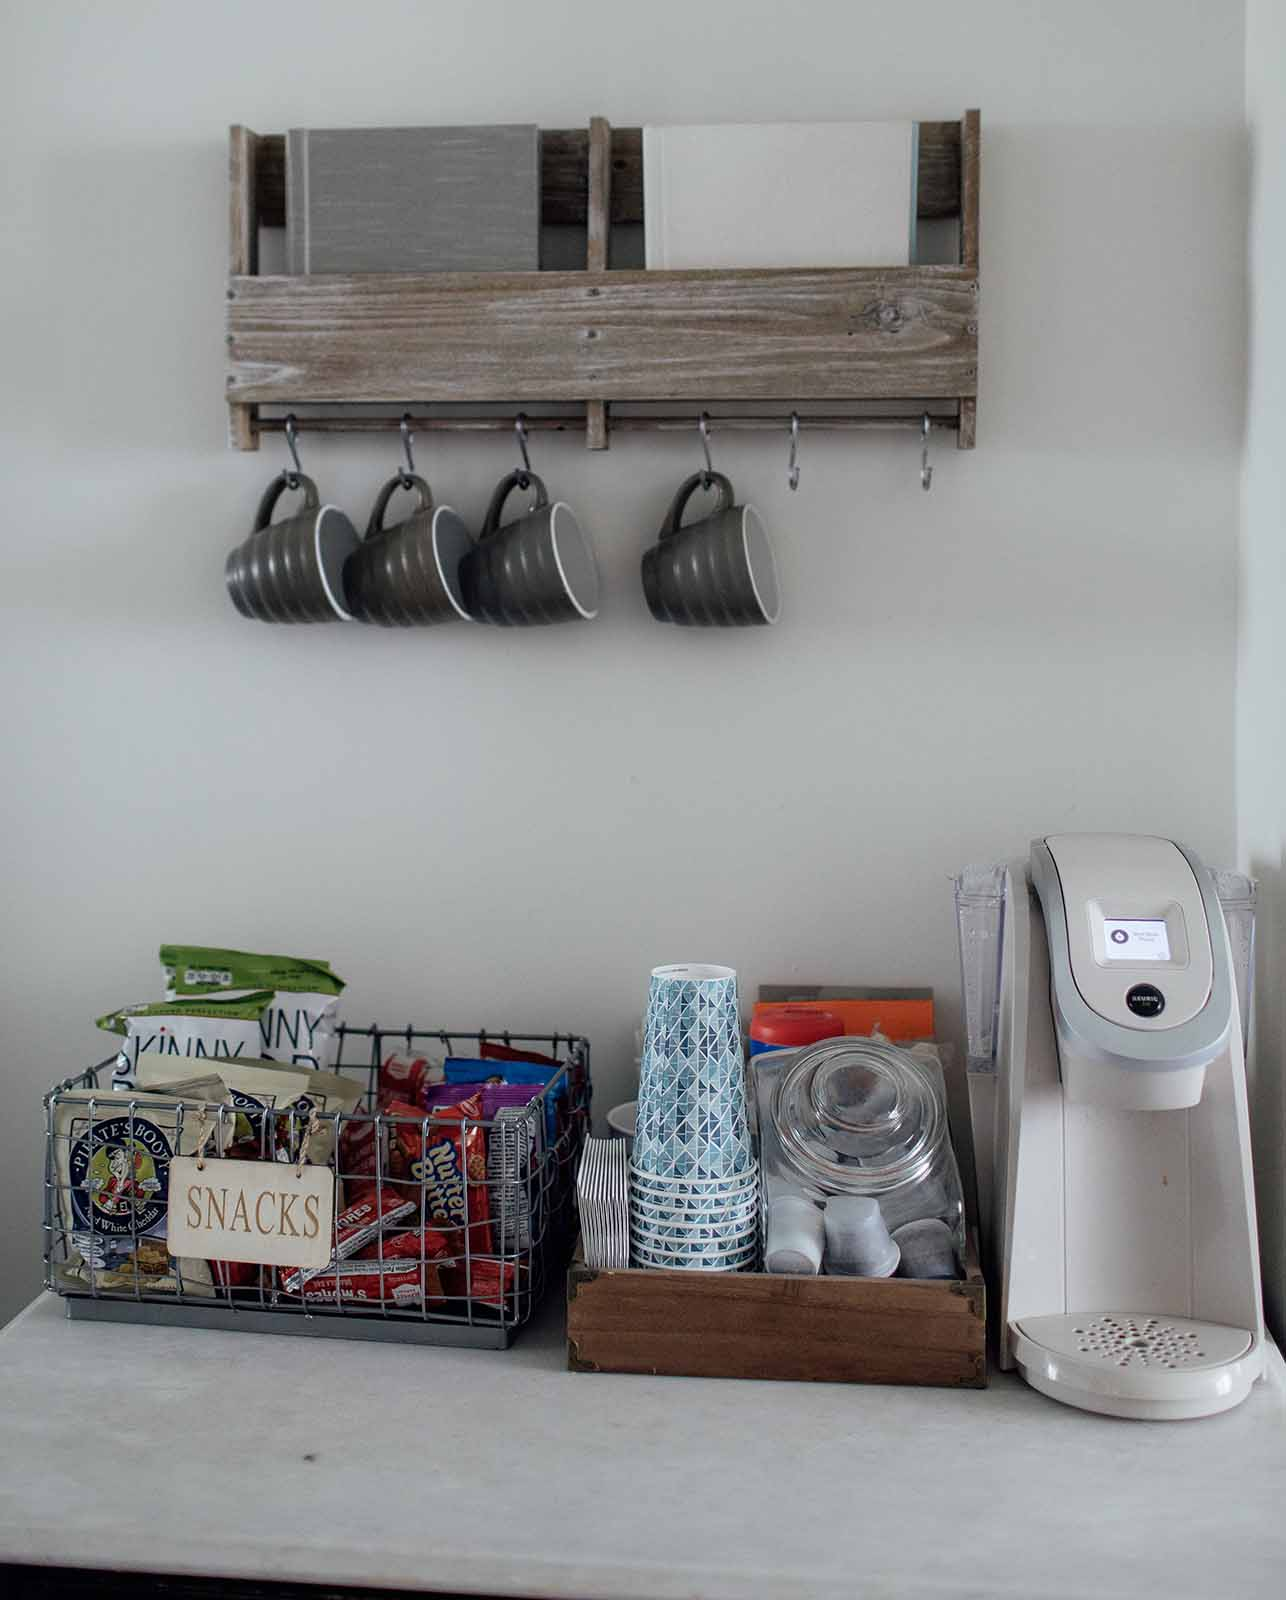 Newborn photography studio essentials - coffee and tea bar